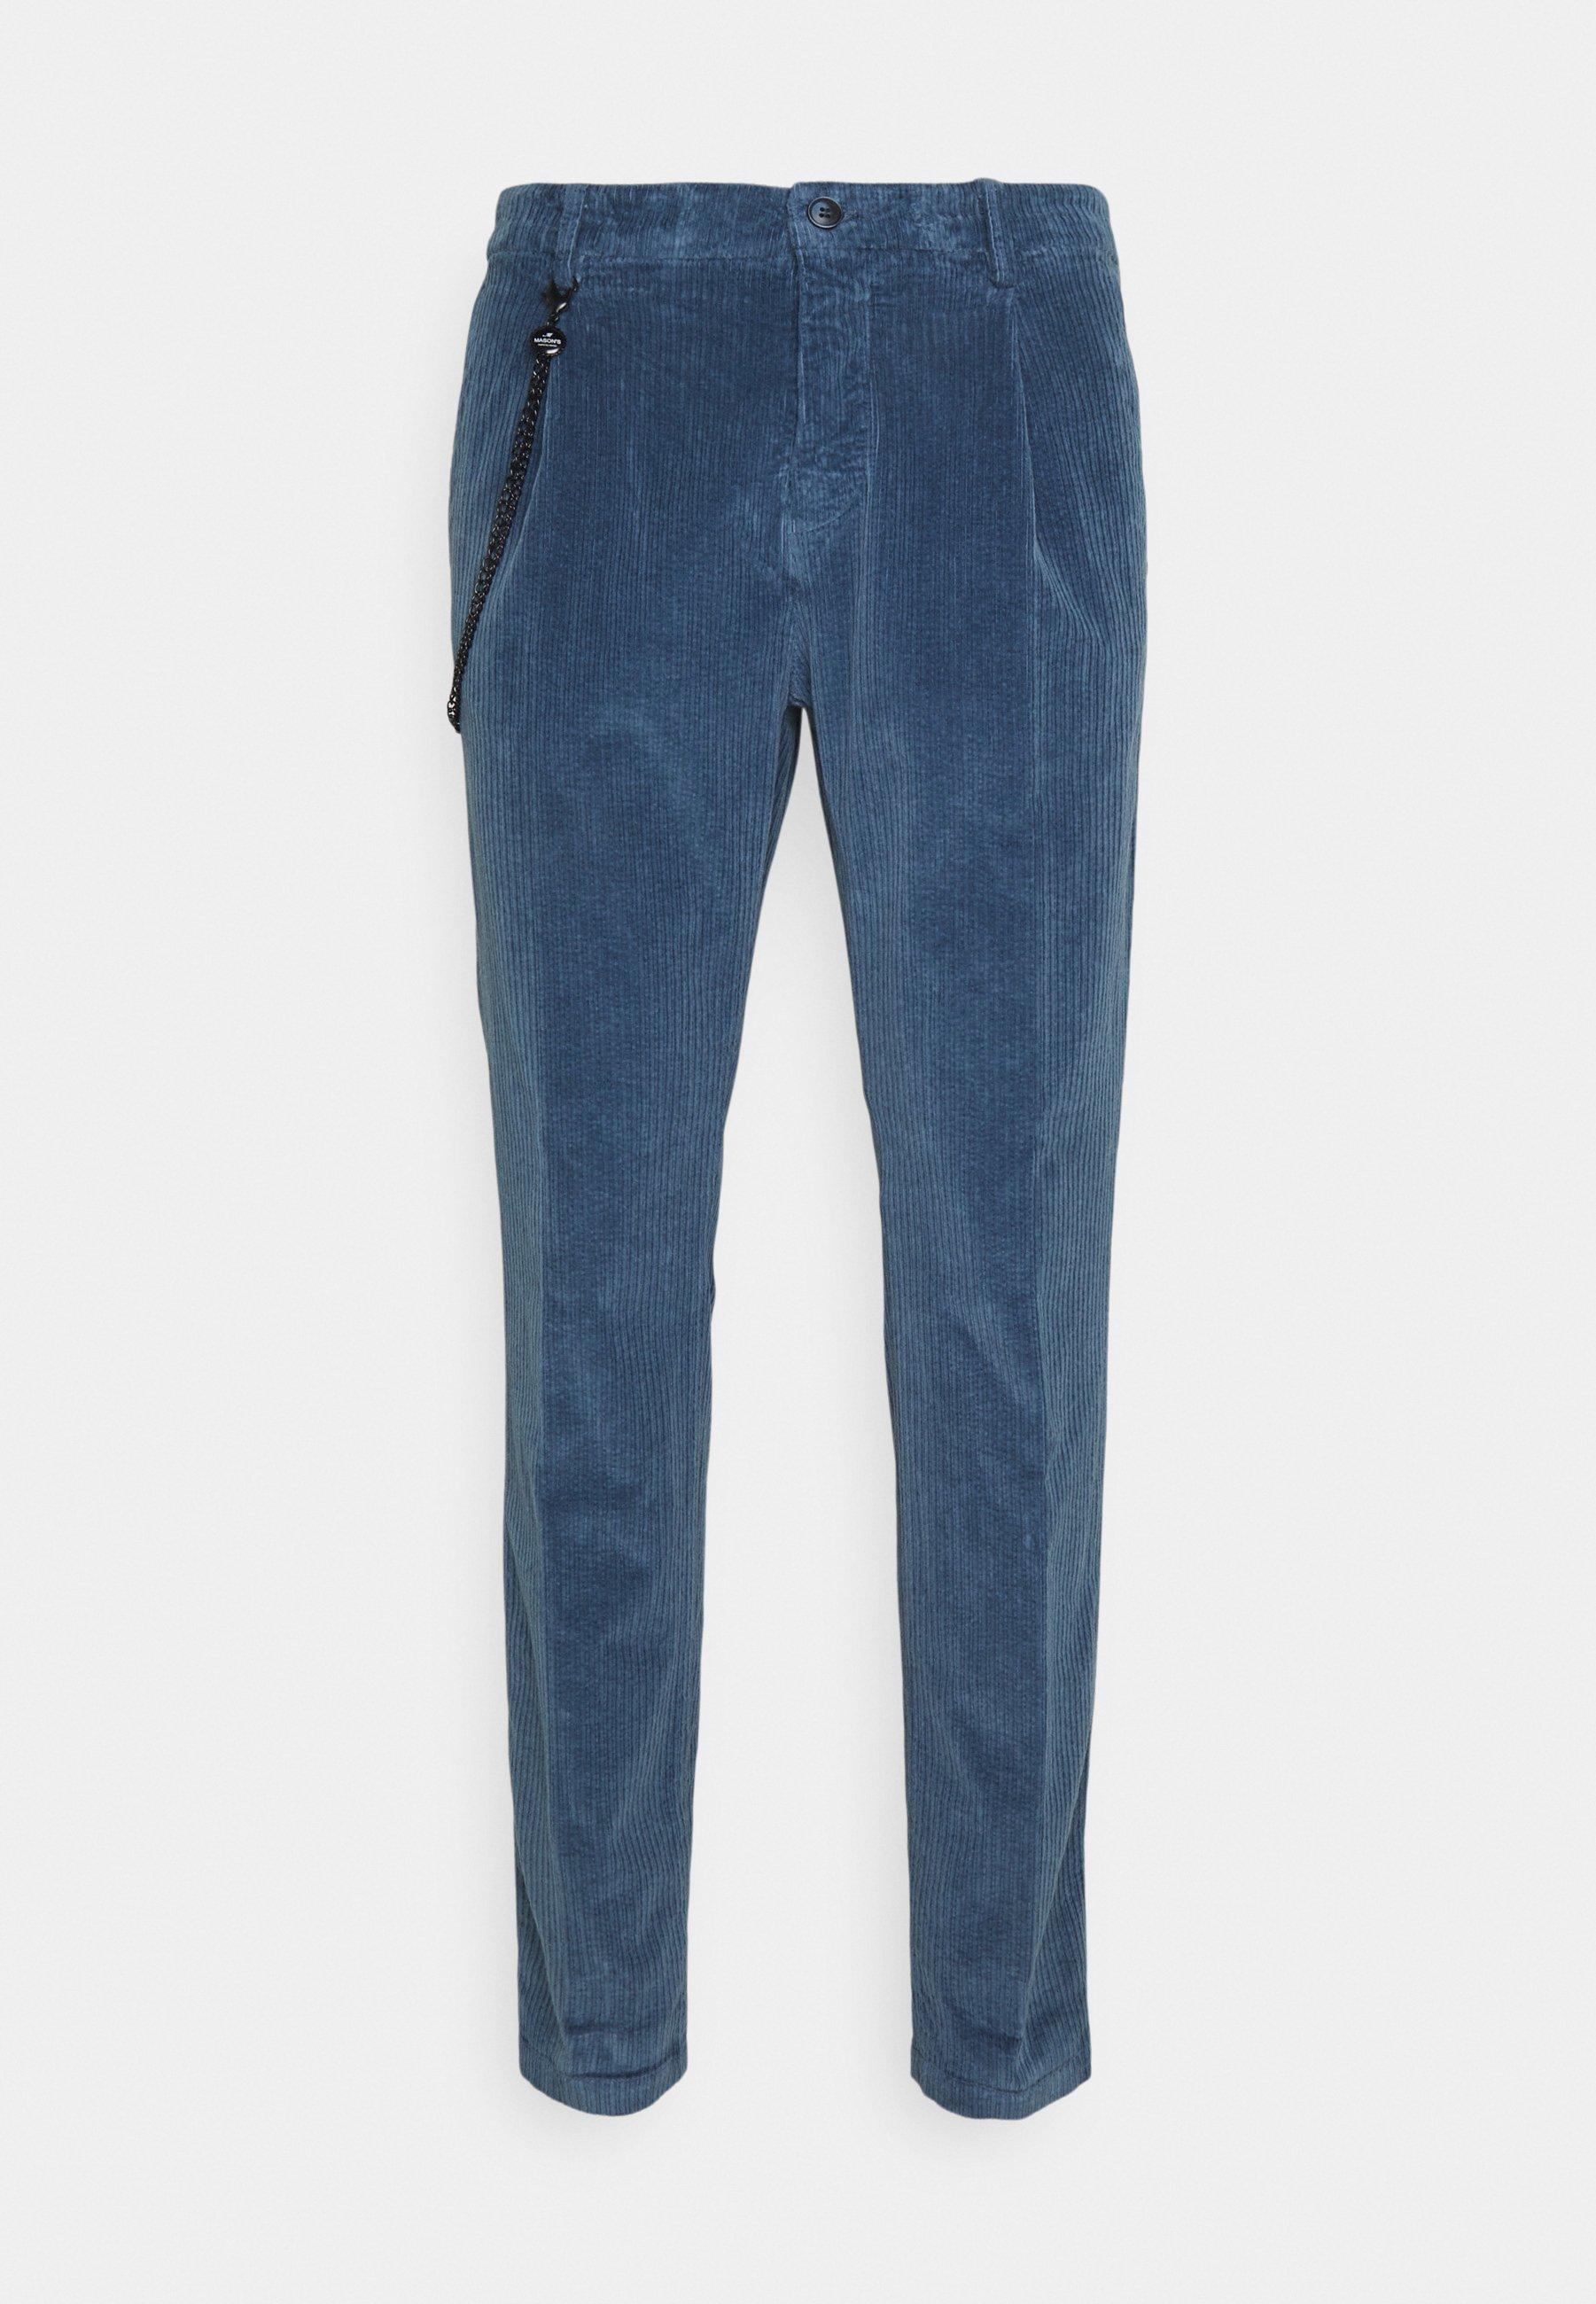 Uomo OSAKA PINCES - Pantaloni